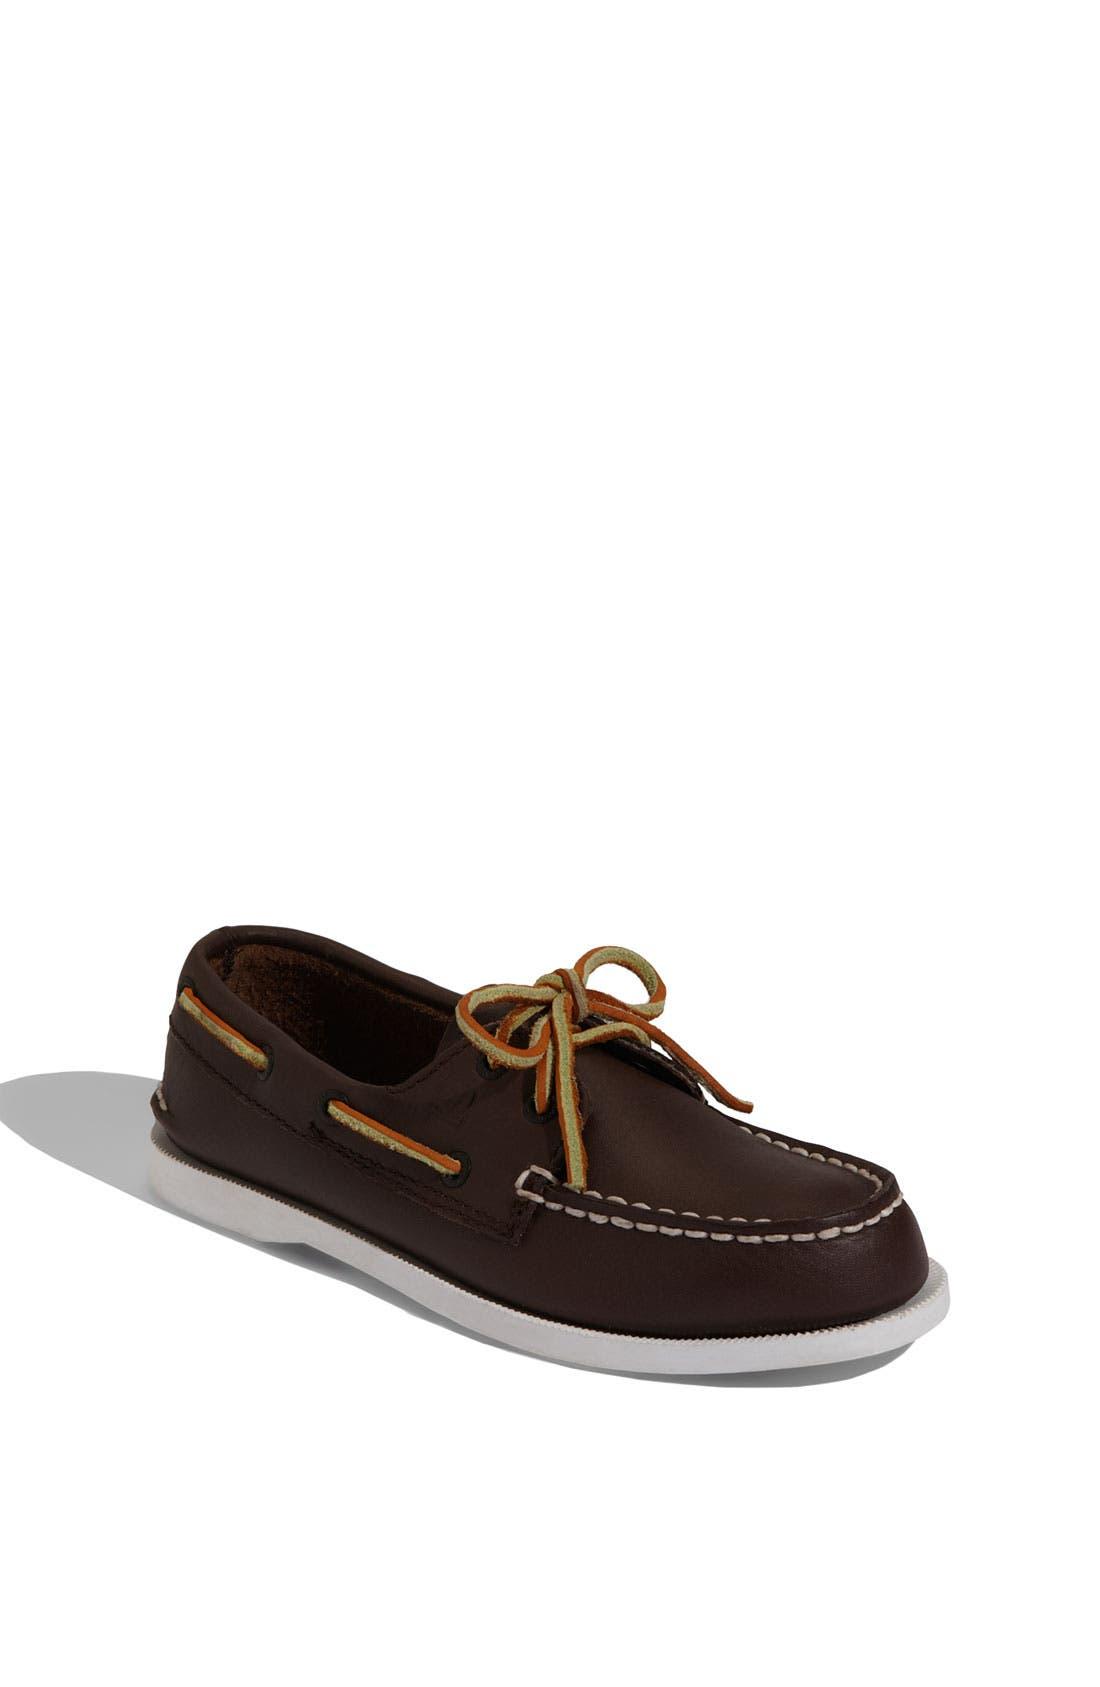 SPERRY KIDS 'Authentic Original' Boat Shoe